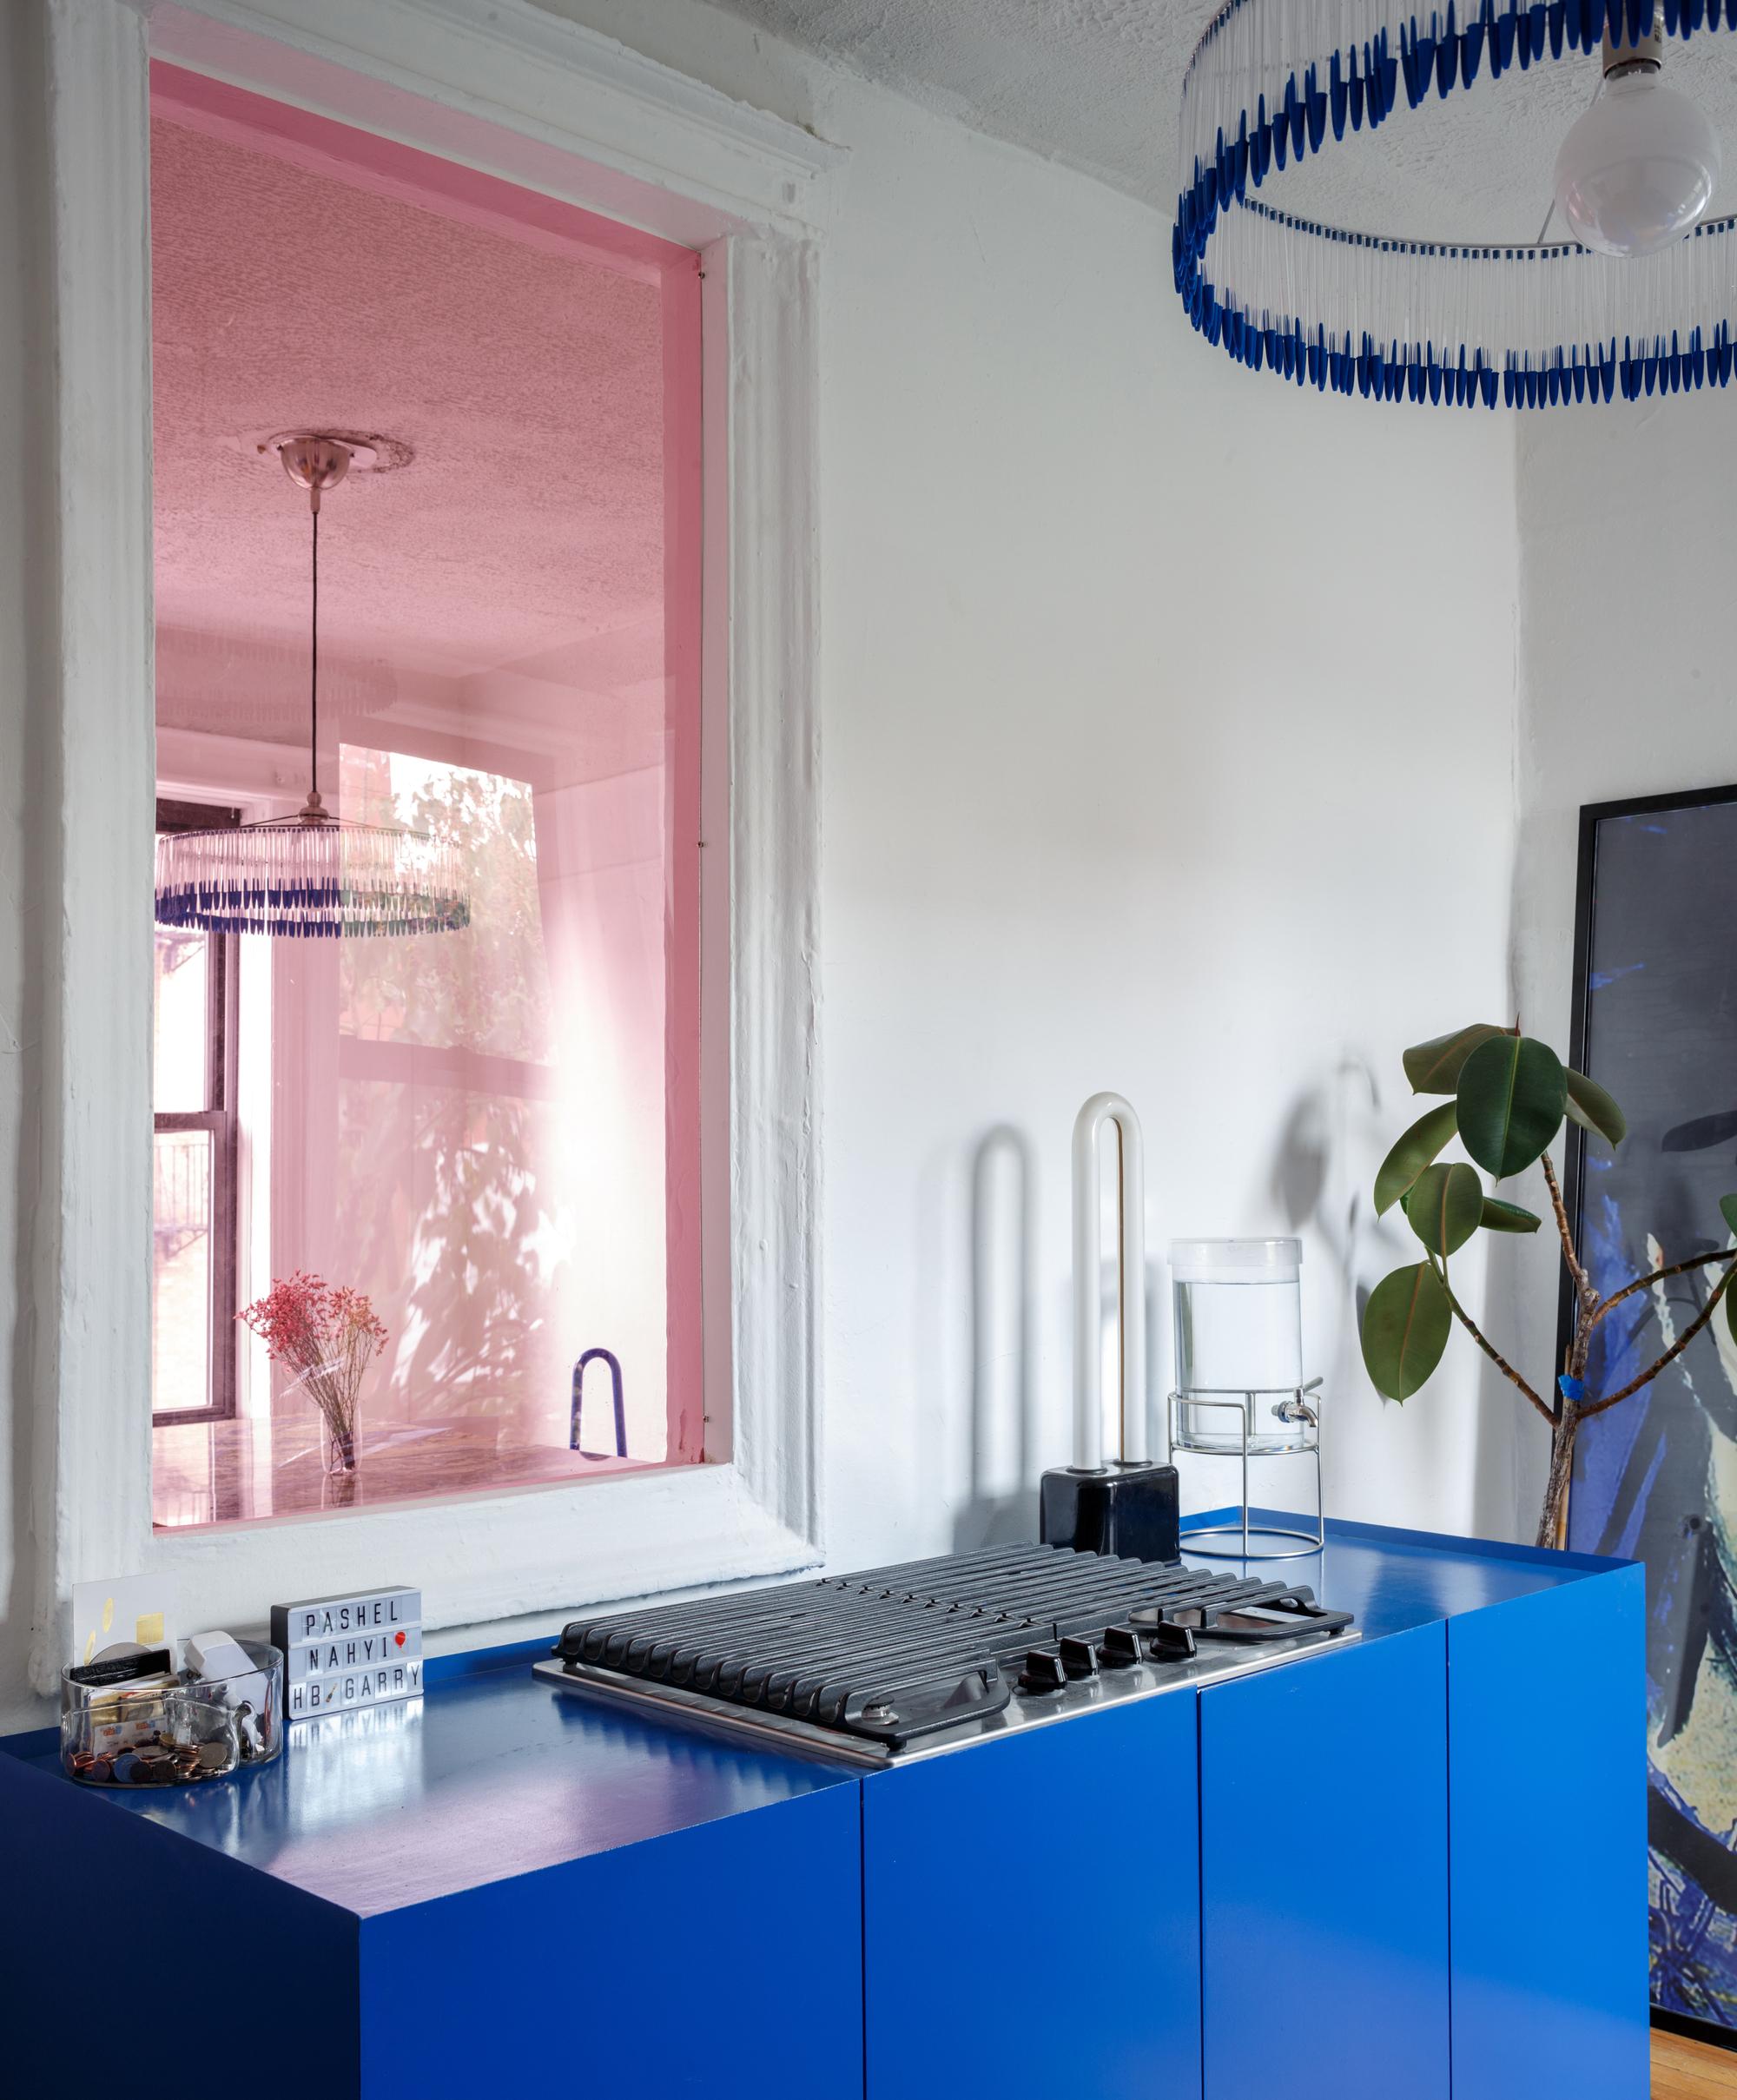 New York Studio Apartments: Gallery Of Apartment In New York / Crosby Studios